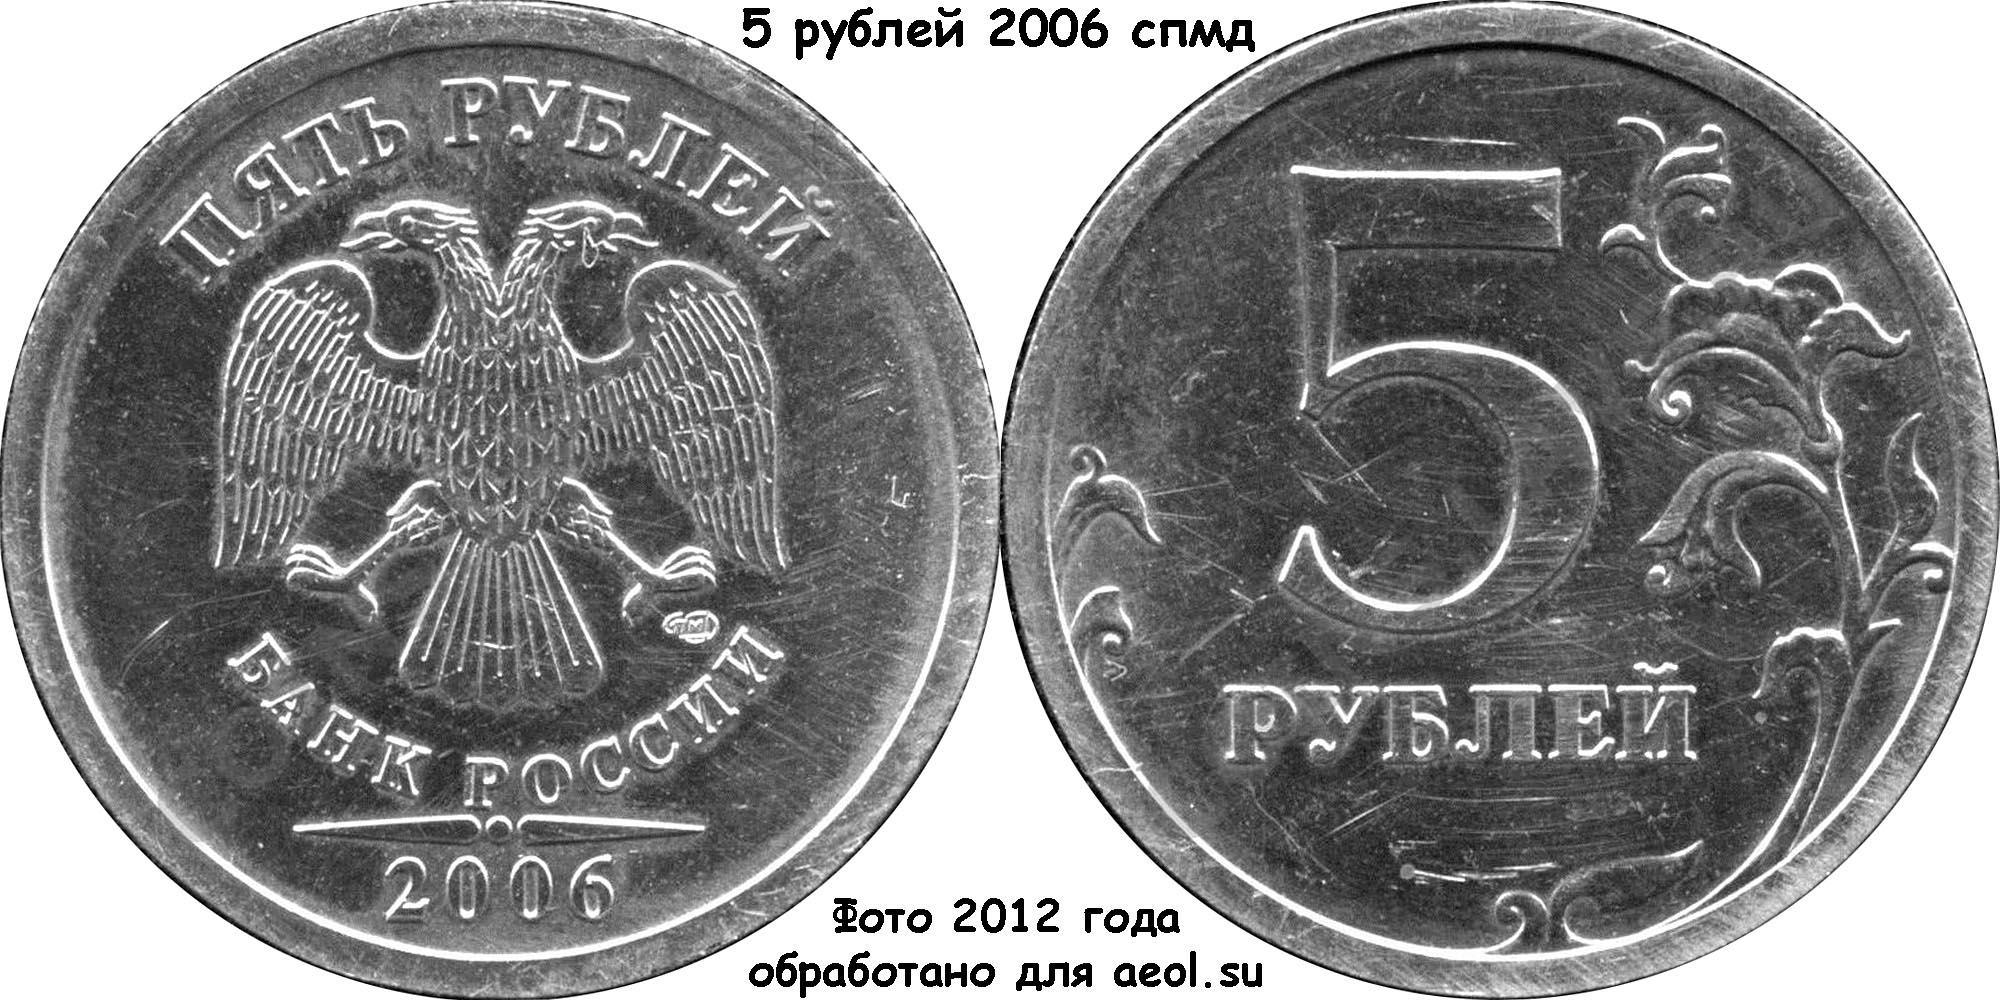 5 рублей 2006 1 копейка 1966 года разновидности цена